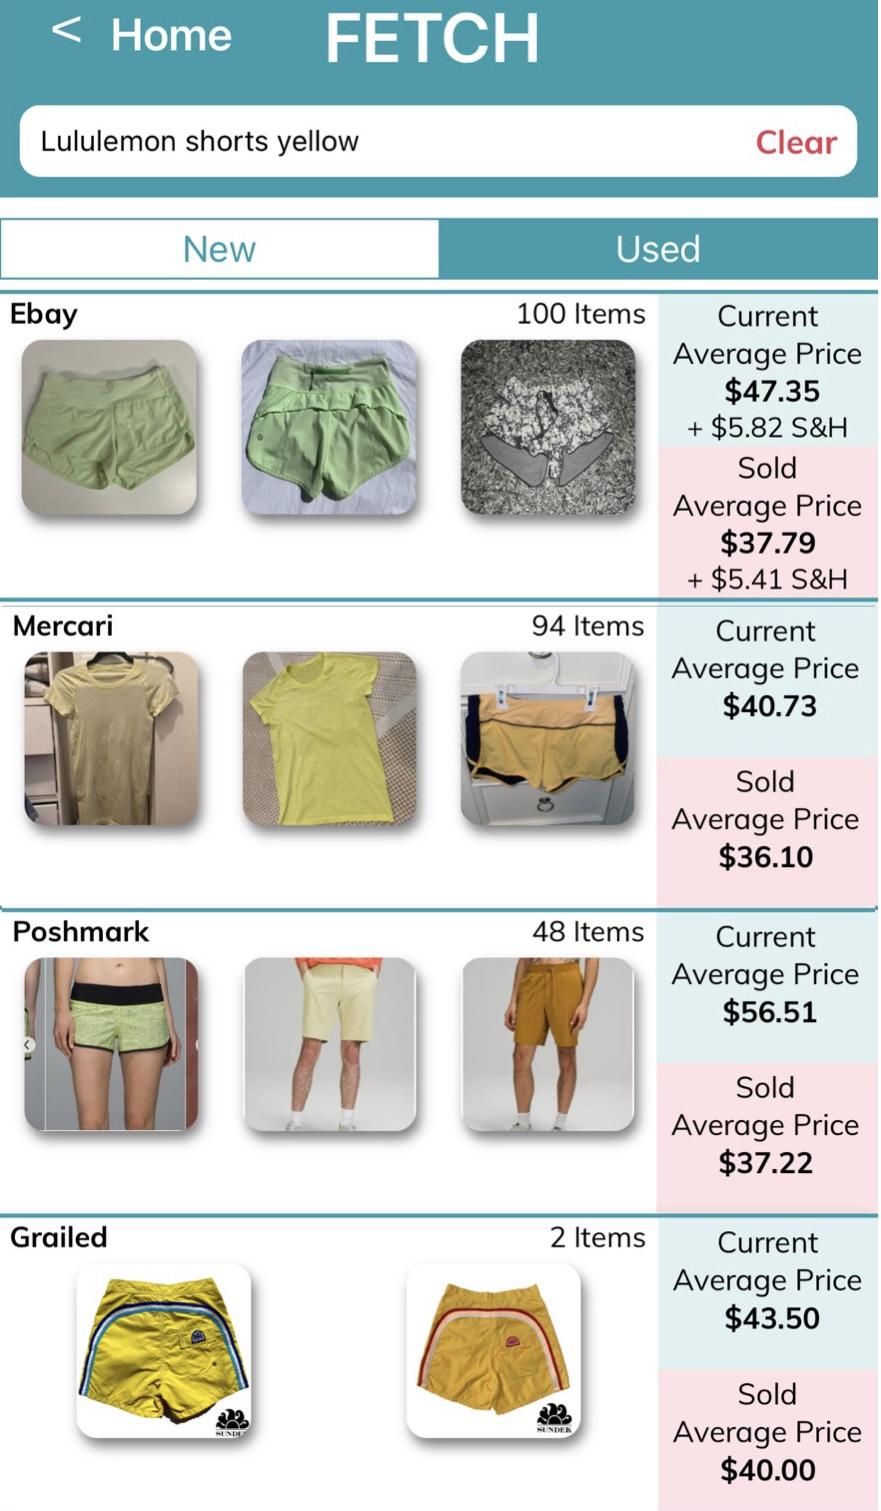 Sellhound price comparison tool